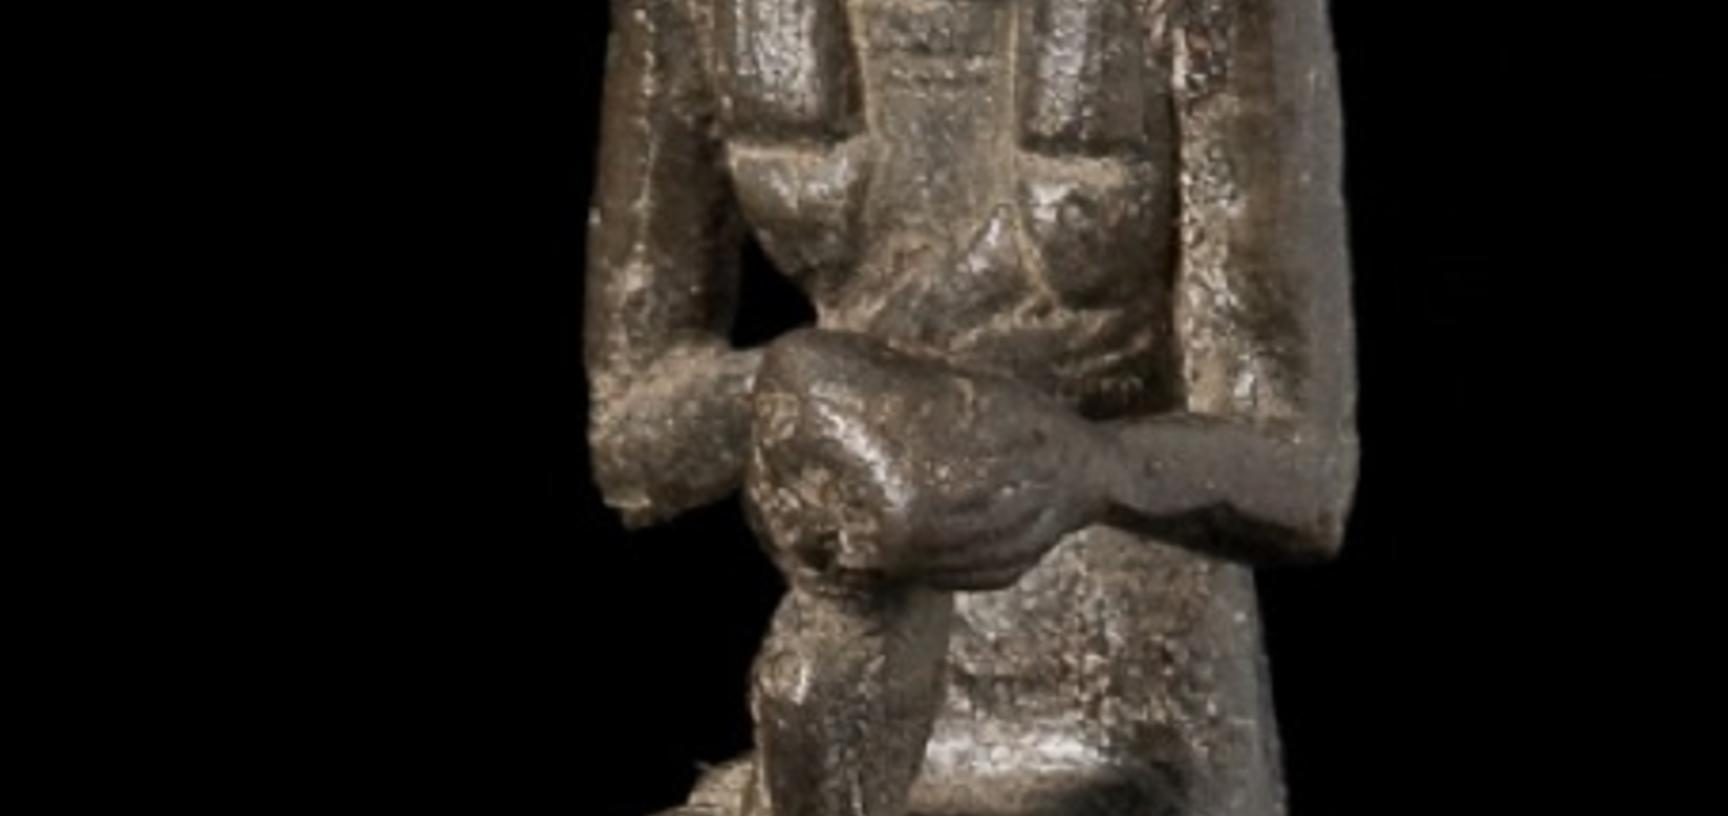 Small seated figure.